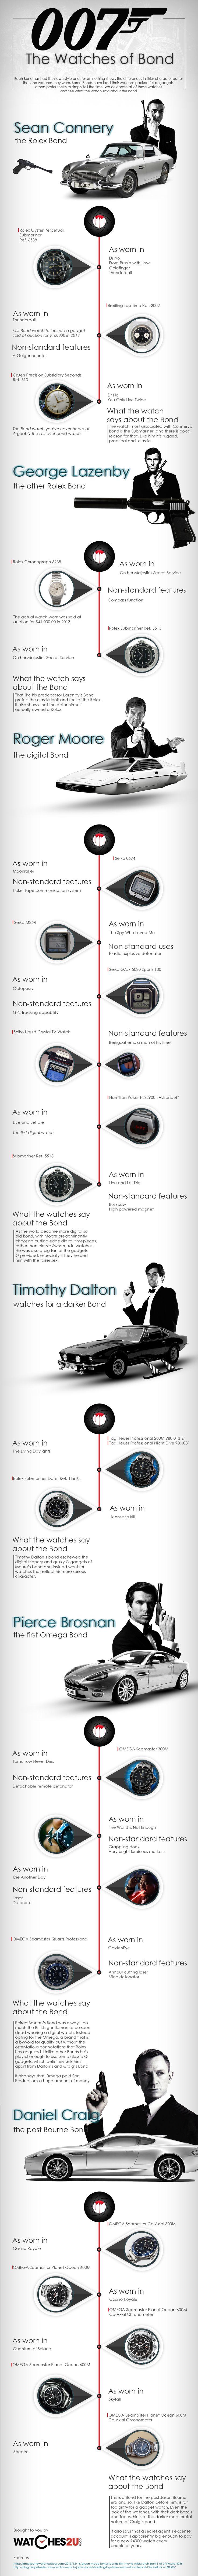 Bond Watches Infographic